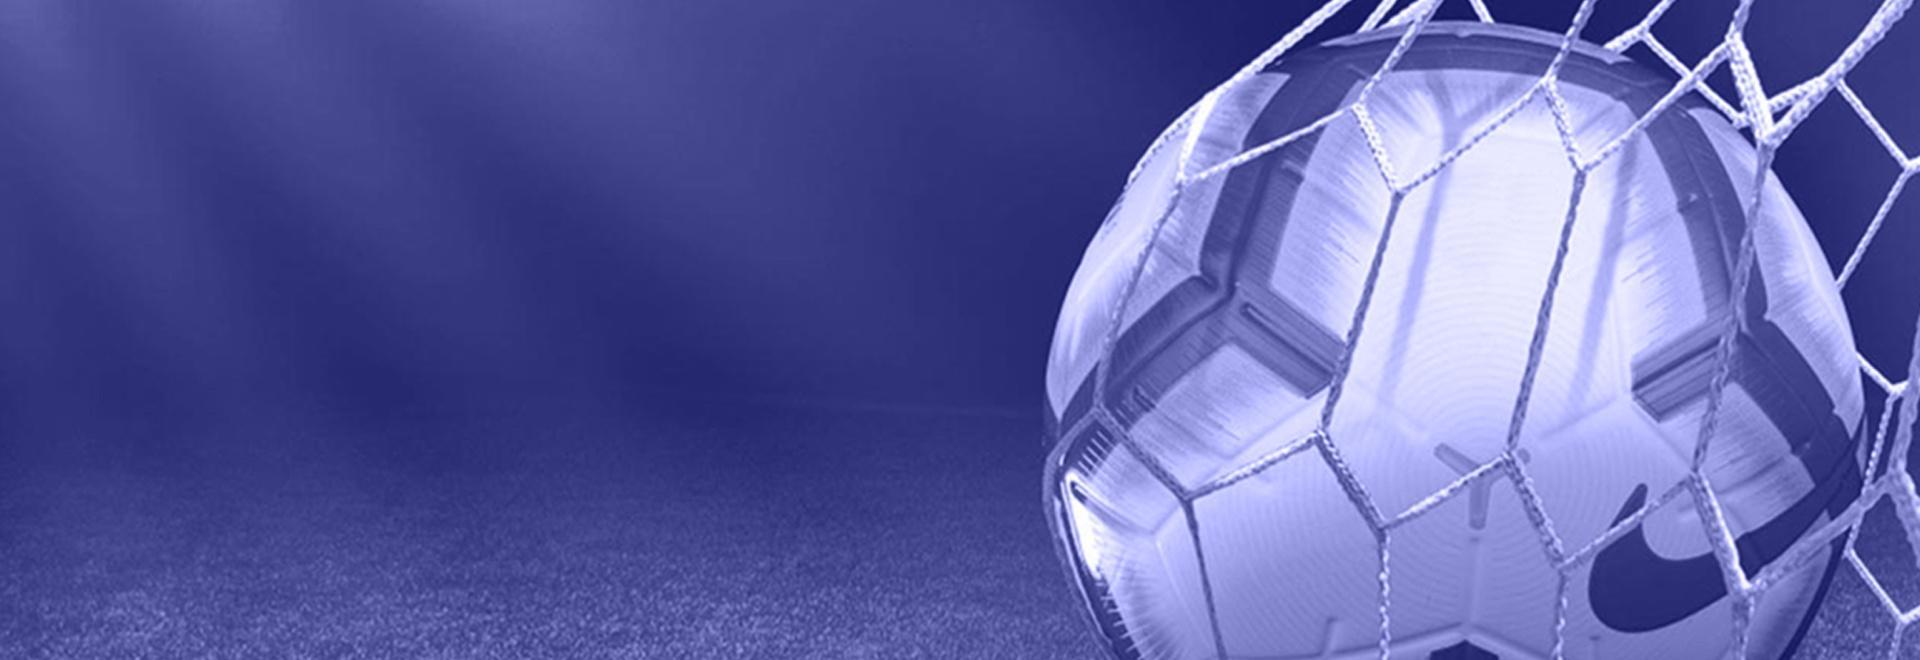 Lazio - Milan 28/09/02